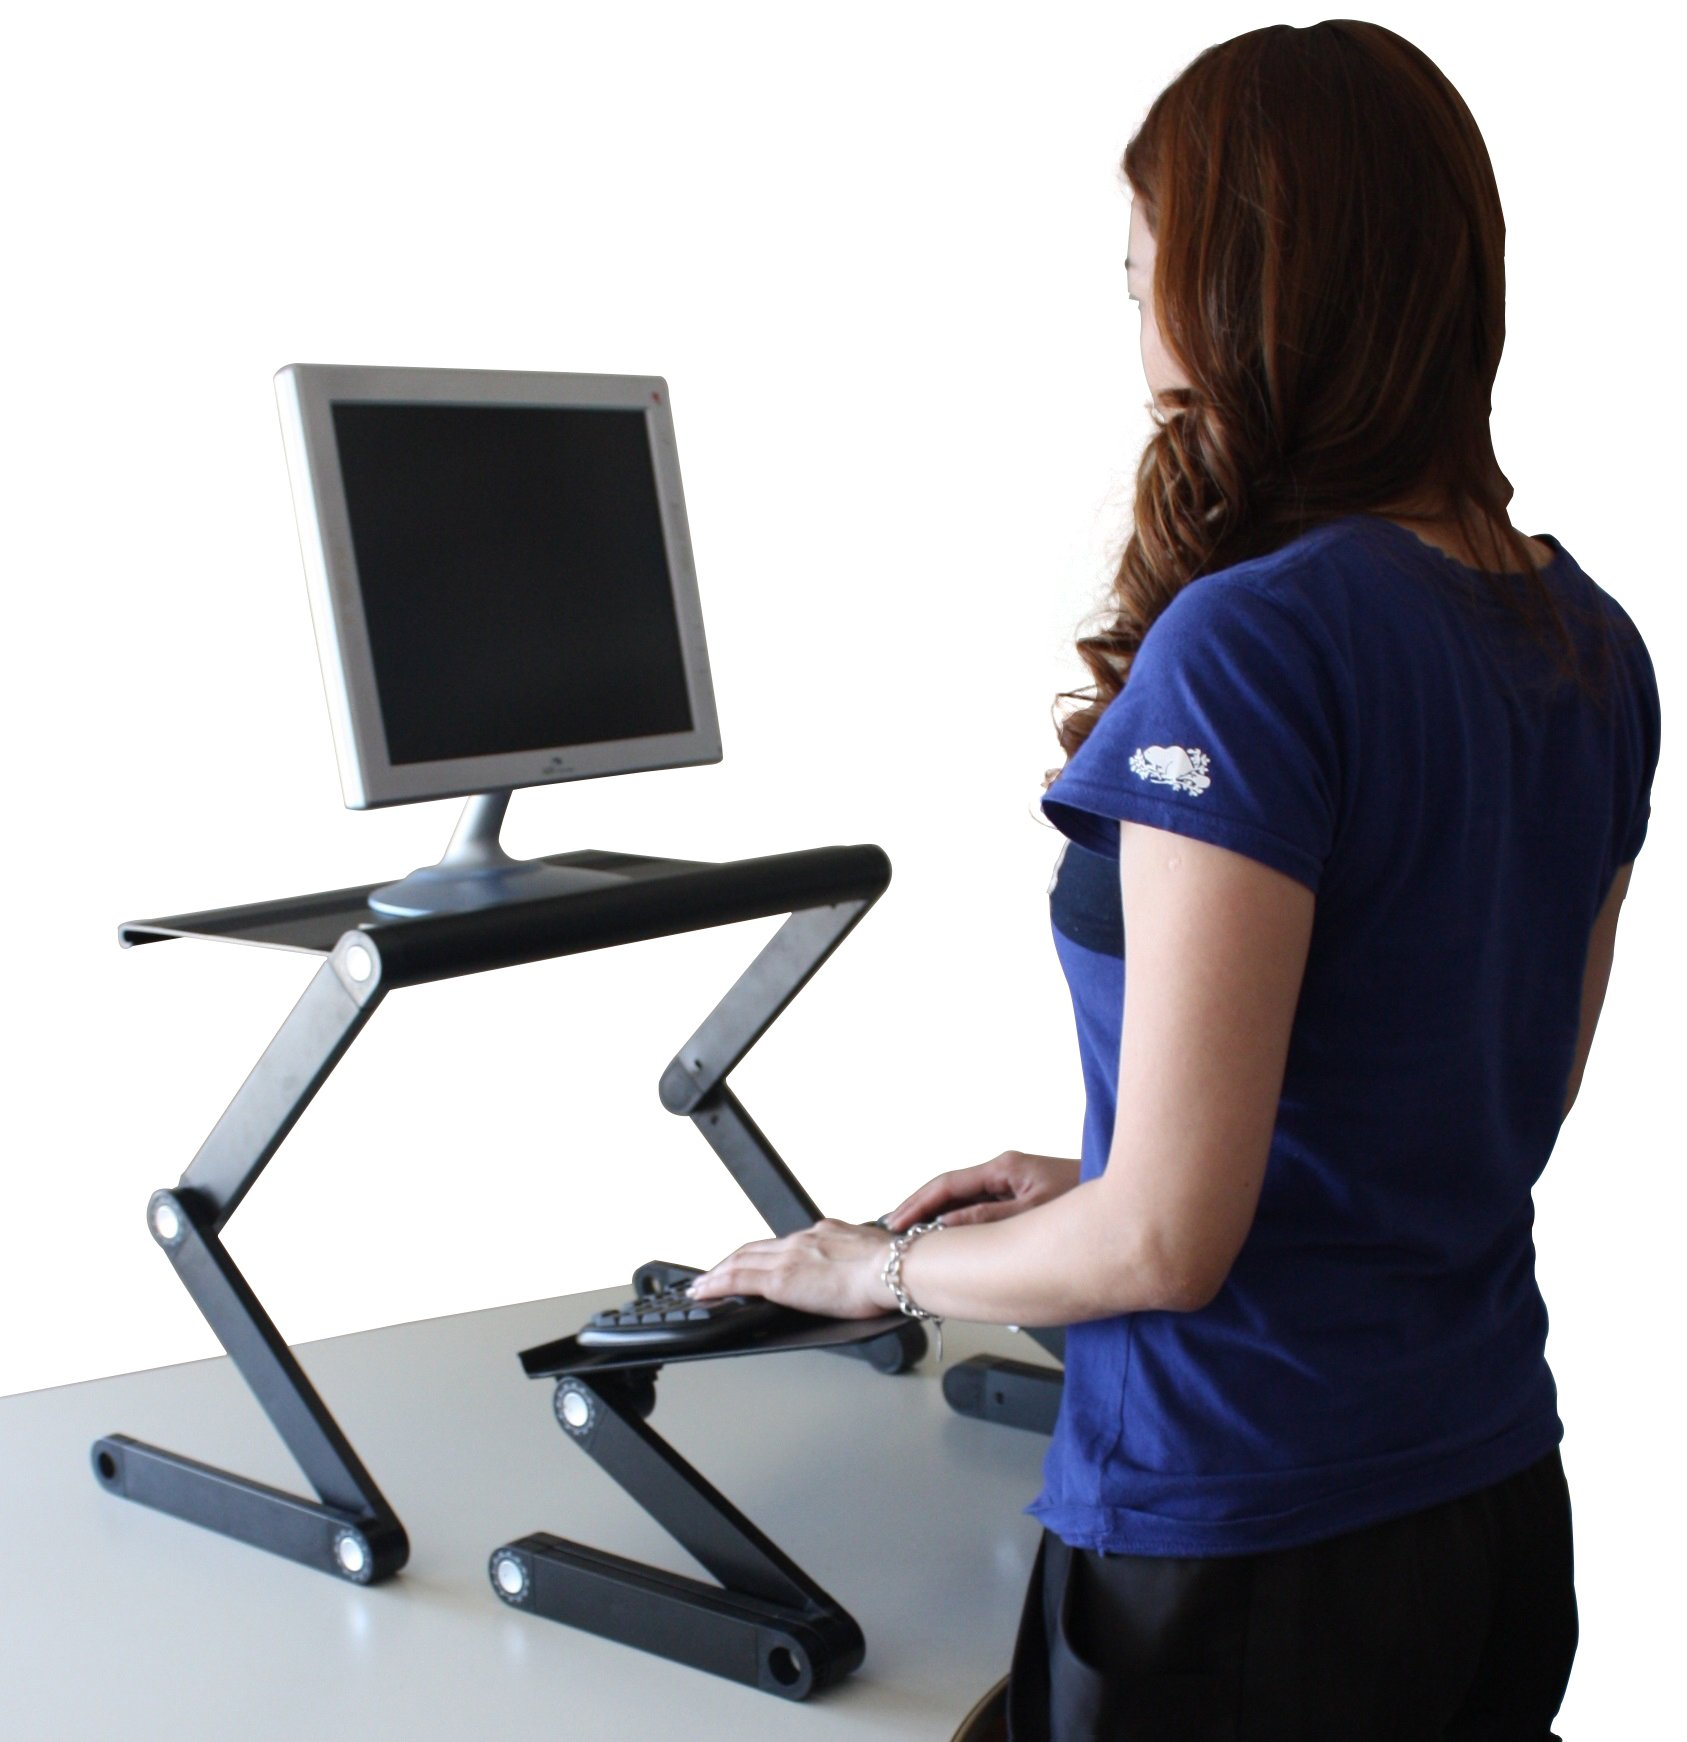 Workez Standing Desk Conversion Kit - Adjustable Ergonomic Sit to Stand Office Desk for Laptops & Desktops (BLACK) by Uncaged Ergonomics